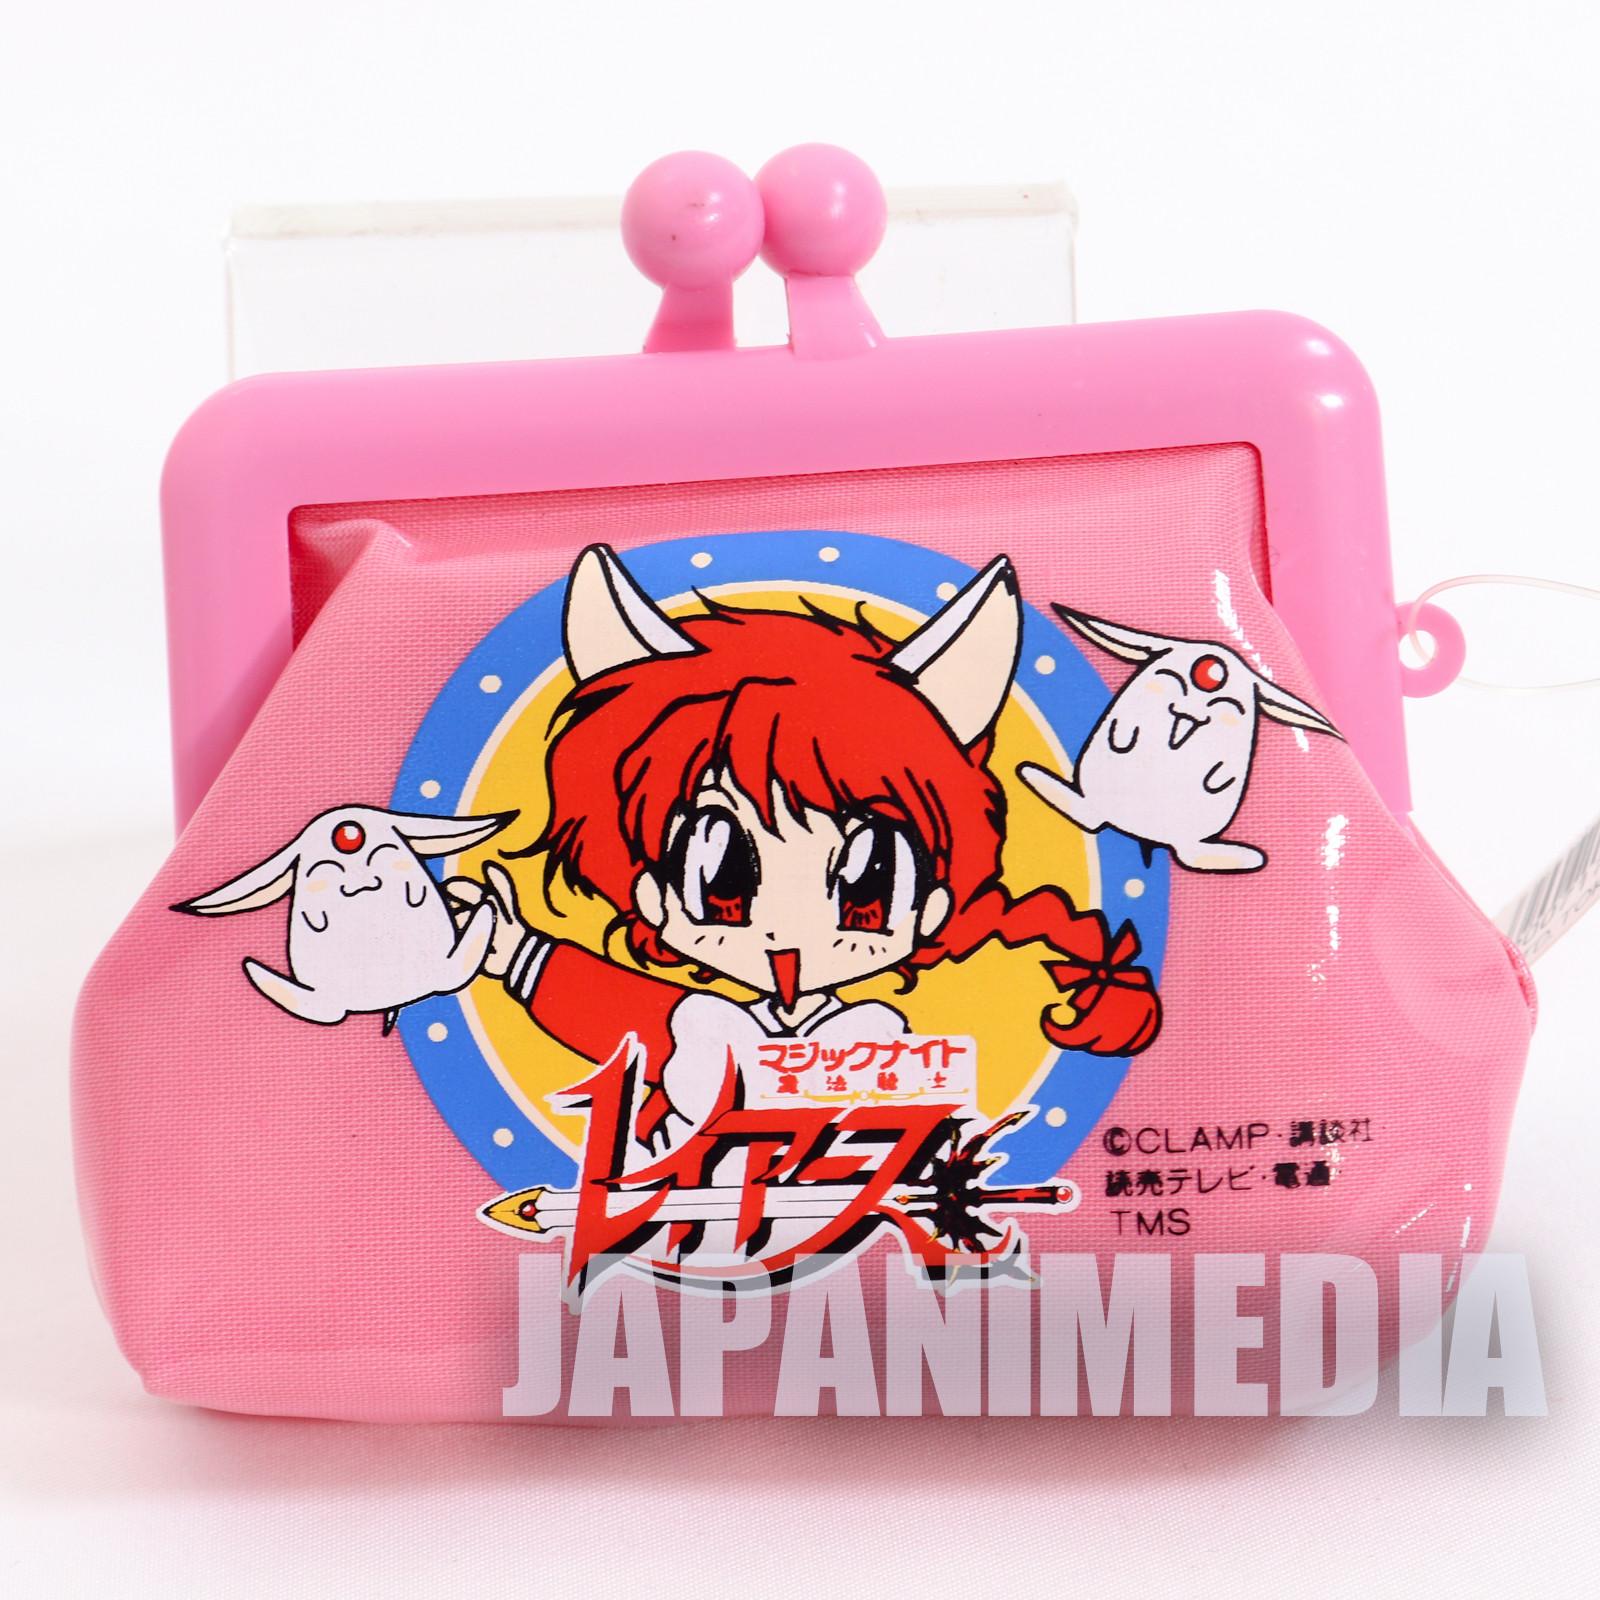 Retro Magic Knight Rayearth Hikaru Shido Purse Coin Case Pink ver. JAPAN